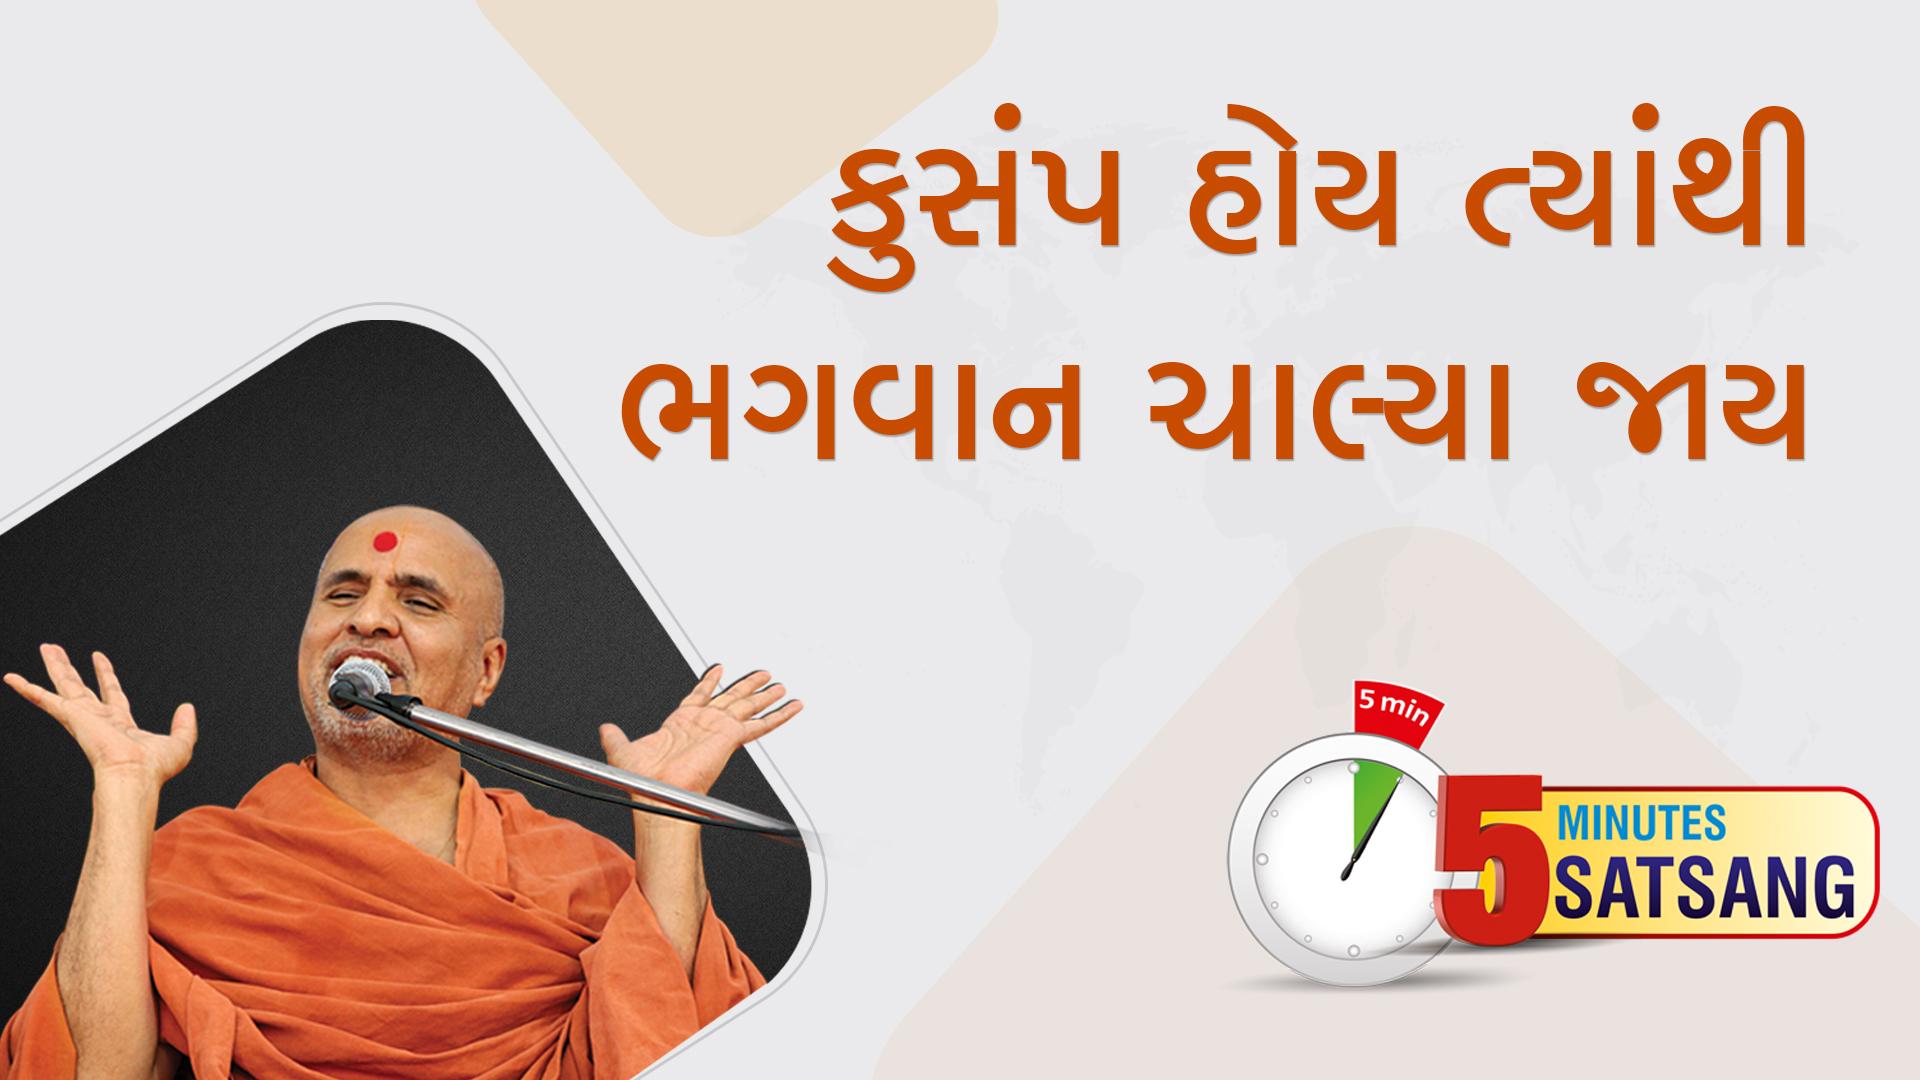 Kusamp Hoy Tyathi Bhagwan Chalya Jaay | 5 Minutes Satsang | HDH Swamishri